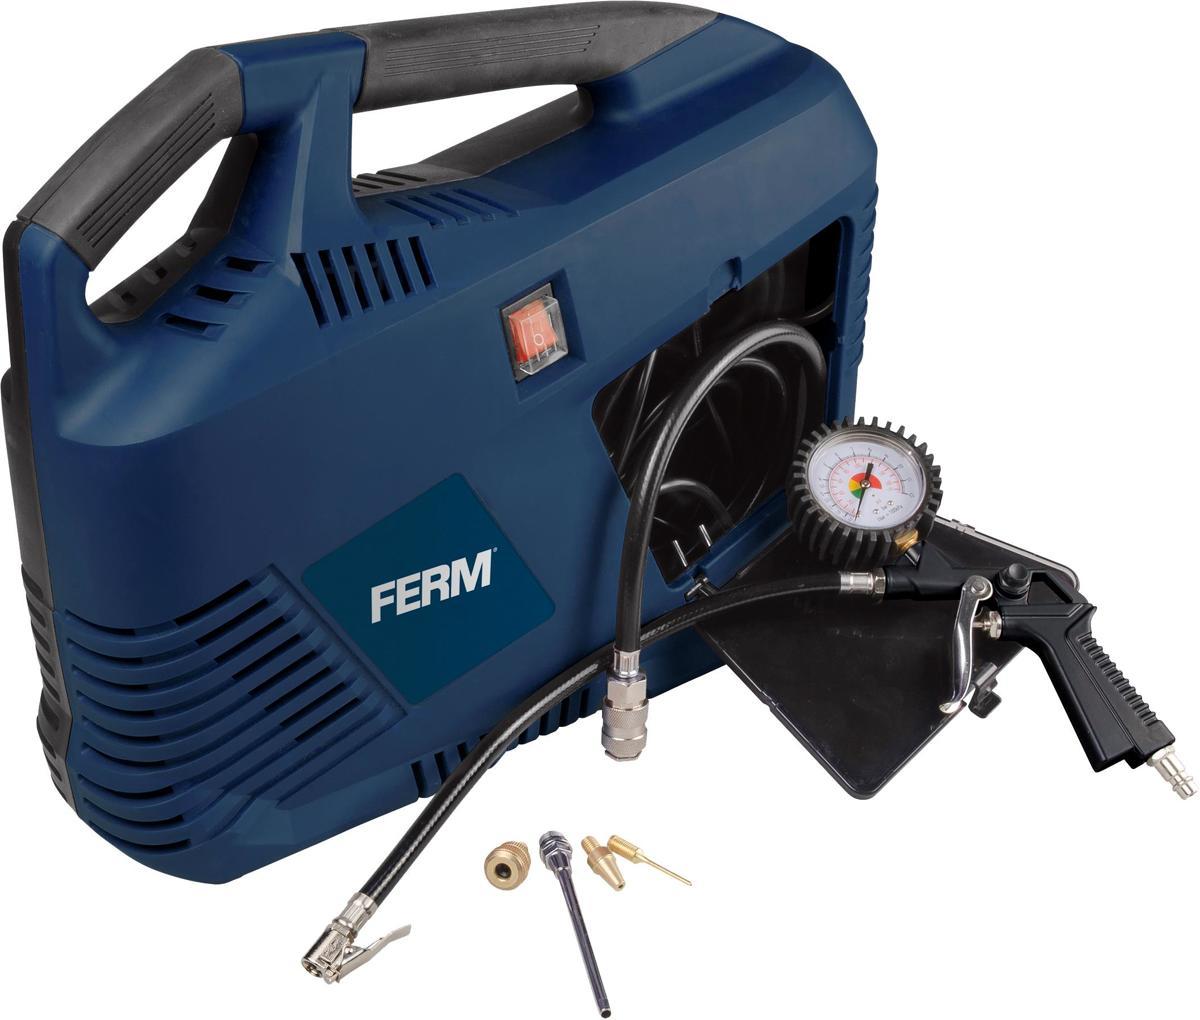 Wonderlijk bol.com | FERM CRM1049 Compressor - 8 bar KQ-82